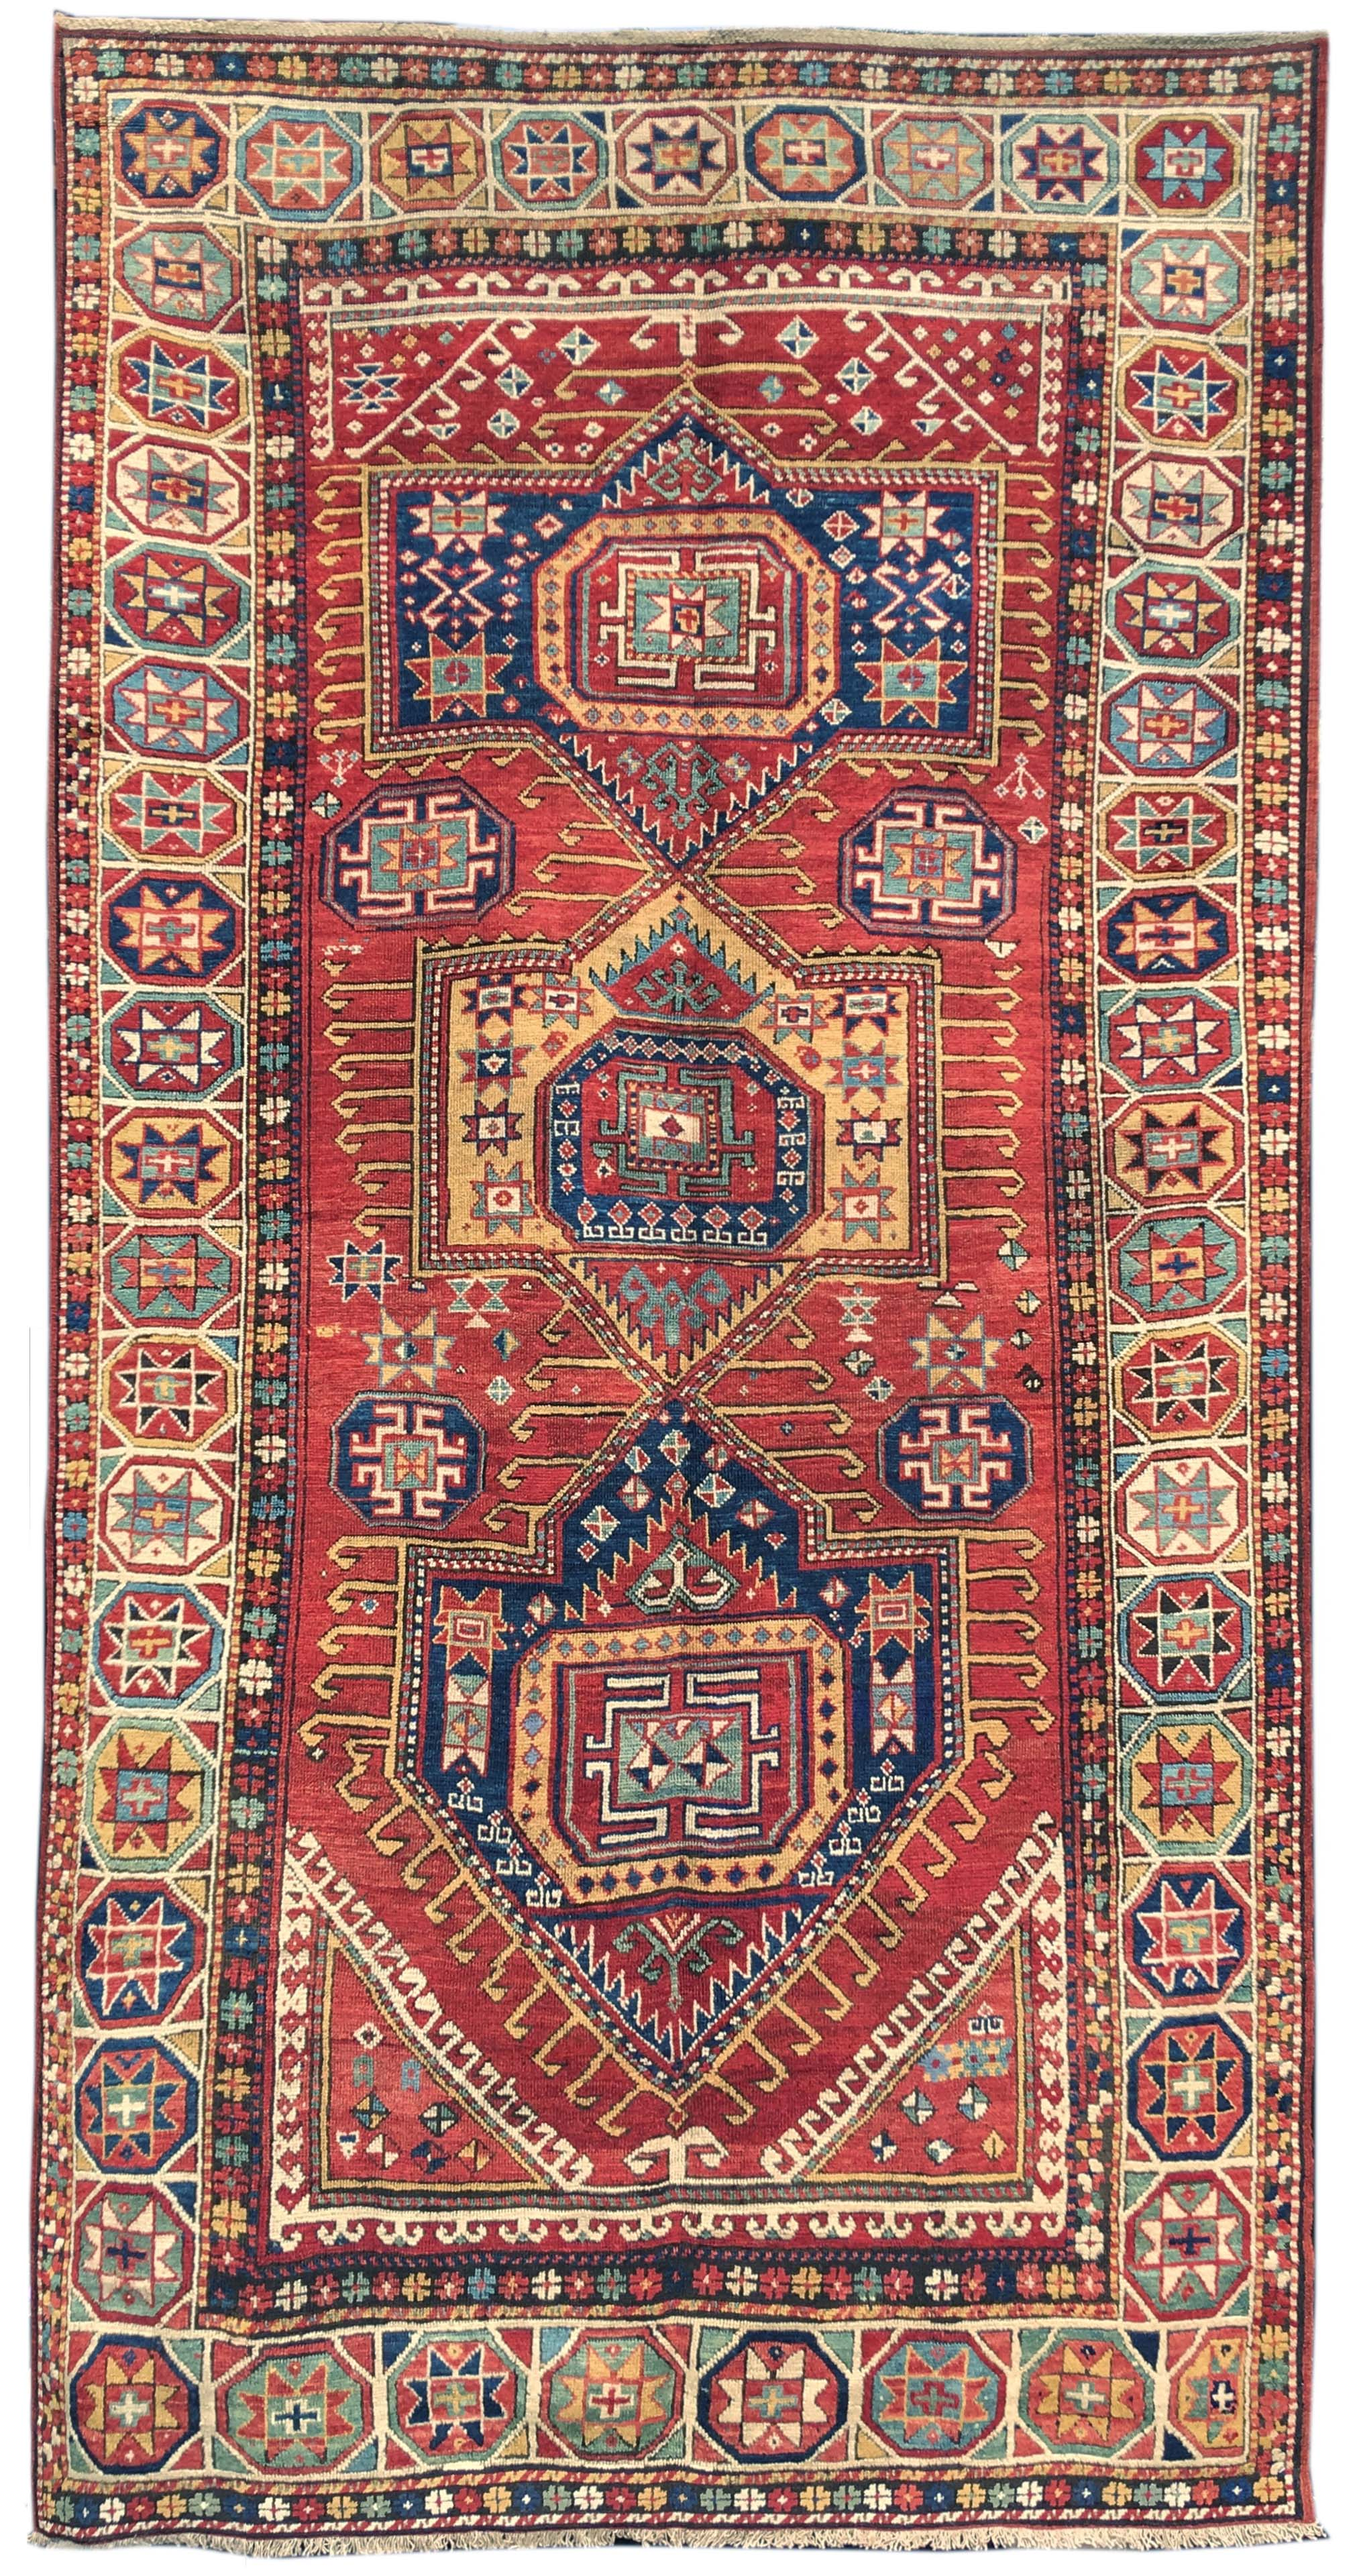 Central Anatolian rug